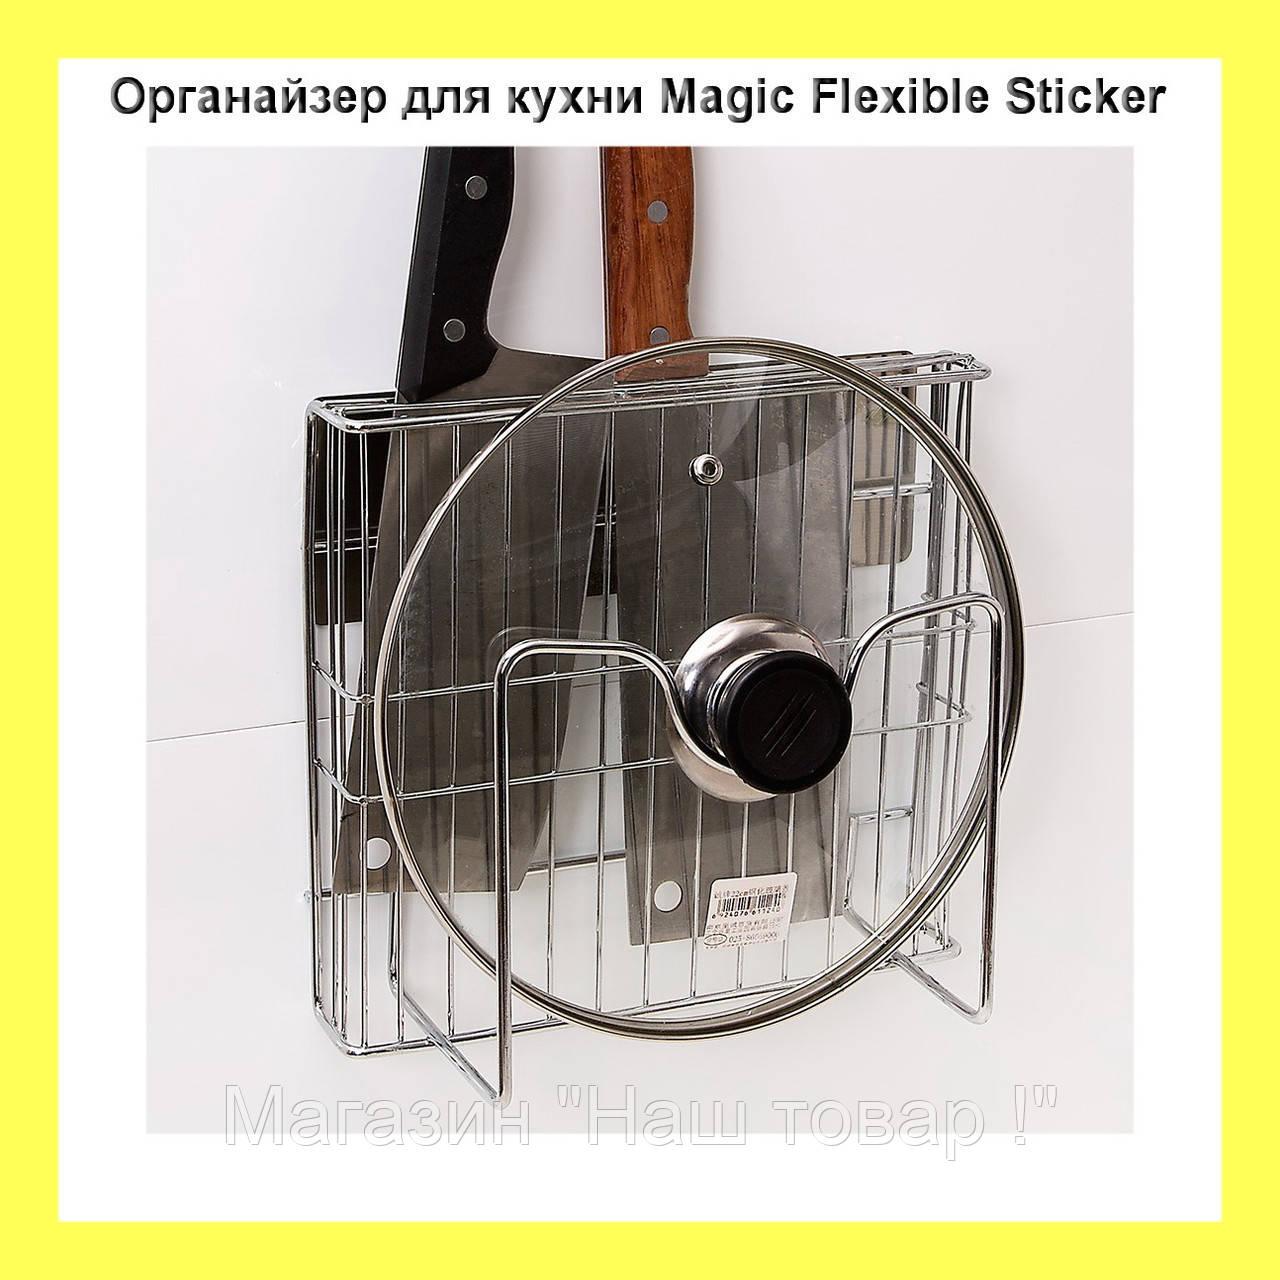 Органайзер для кухни Magic Flexible Sticker!Акция